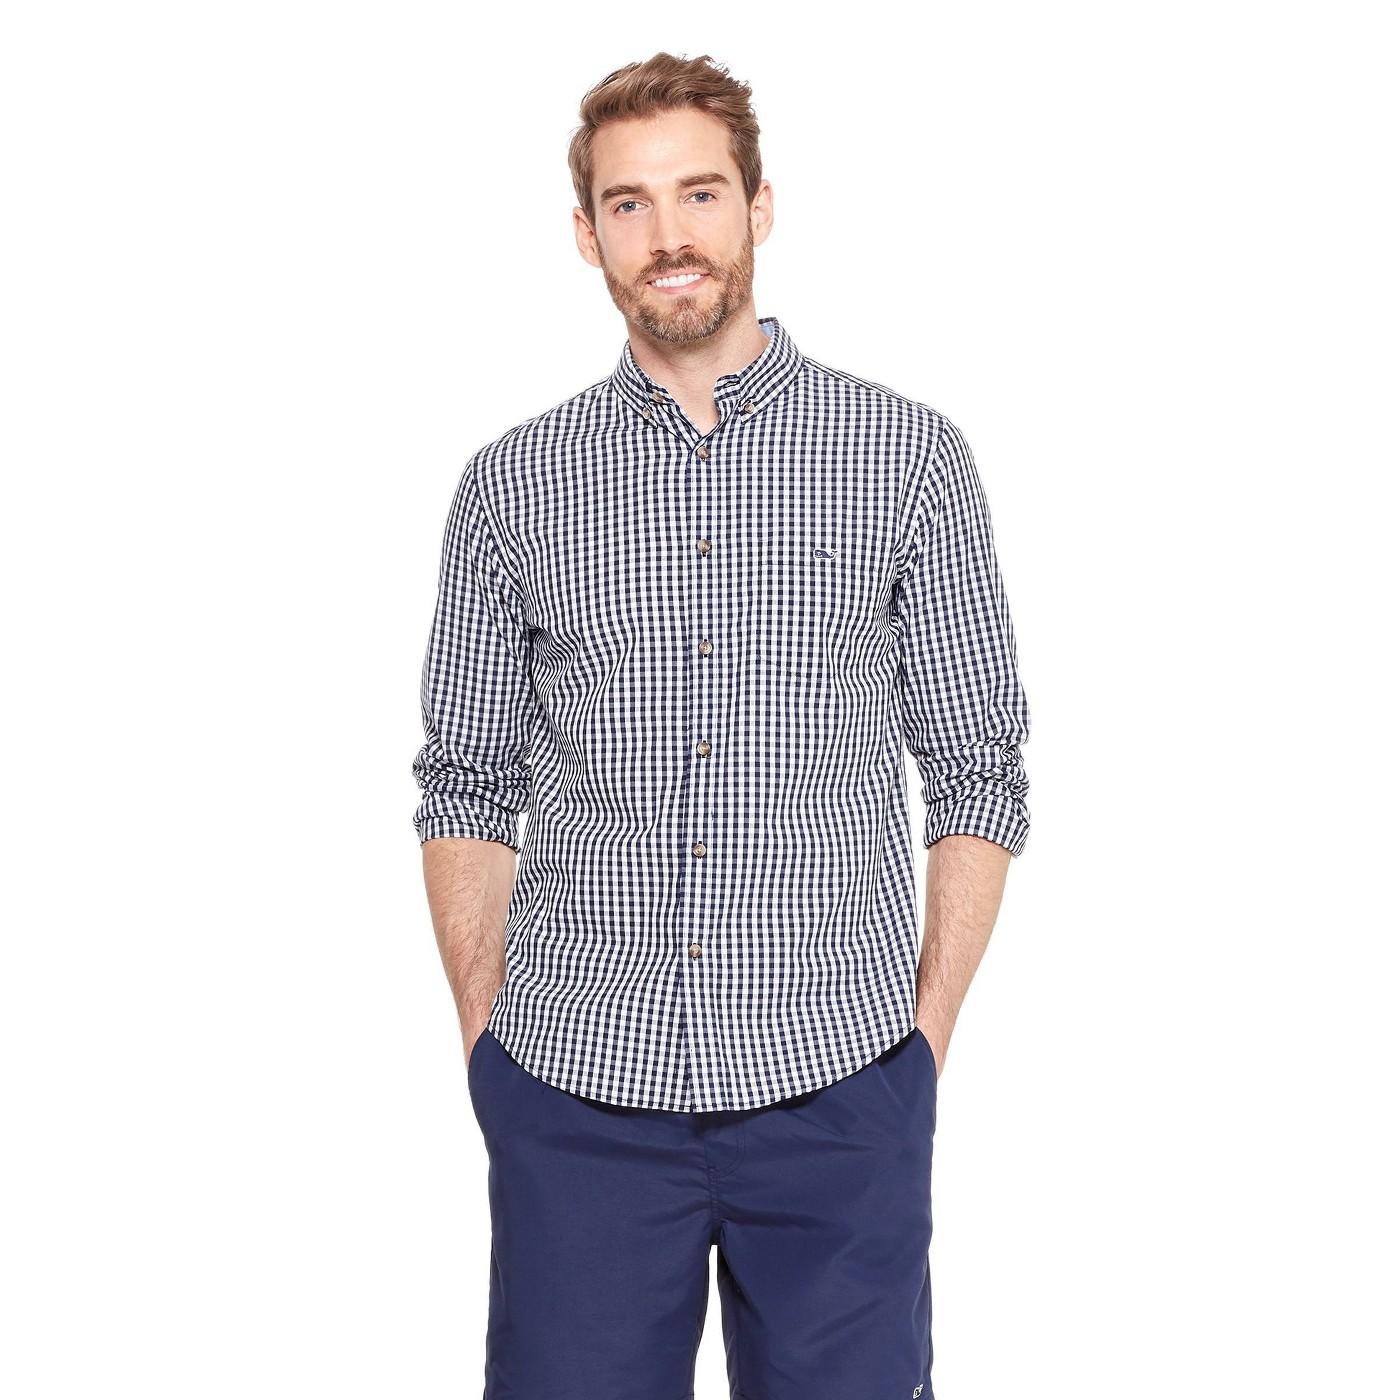 Men's Gingham Long Sleeve Woven Button-Down Shirt - Navy/White - vineyard vines® for Target - image 1 of 5